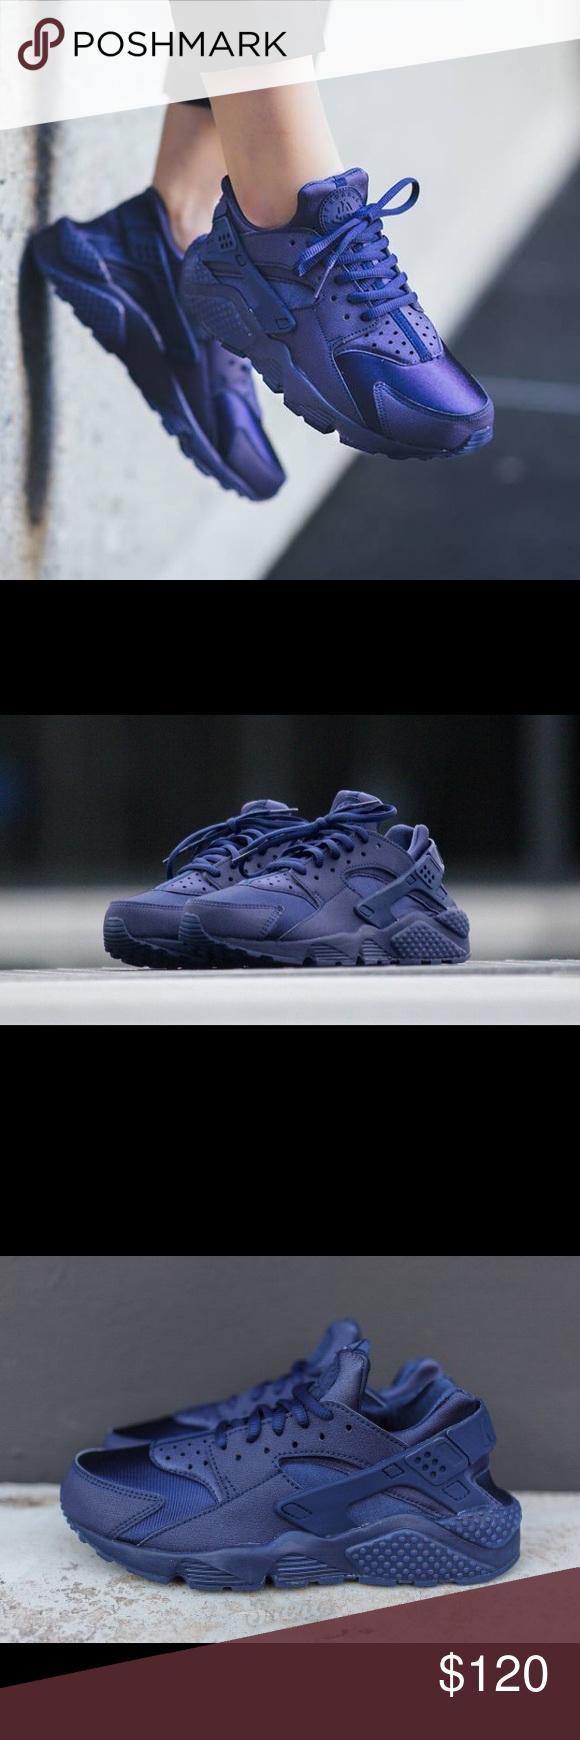 "Spotted while shopping on Poshmark: Nike Huarache "" Run Royal ""! #poshmark #fashion #shopping #style #Nike #Shoes"